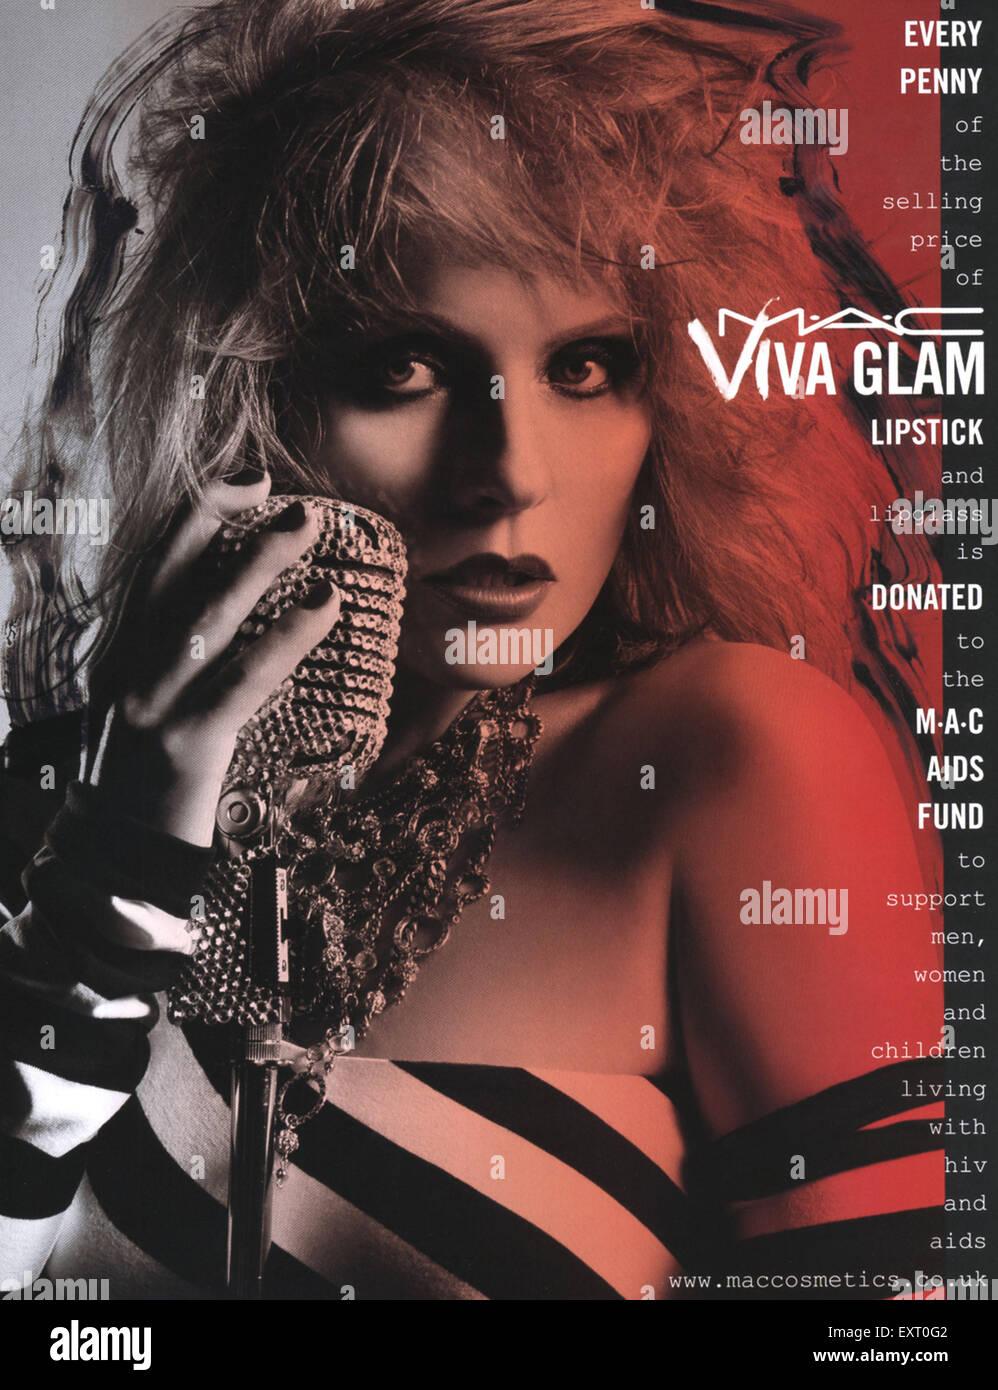 2000s UK MAC Viva Glam, M.A.C Magazine Advert - Stock Image